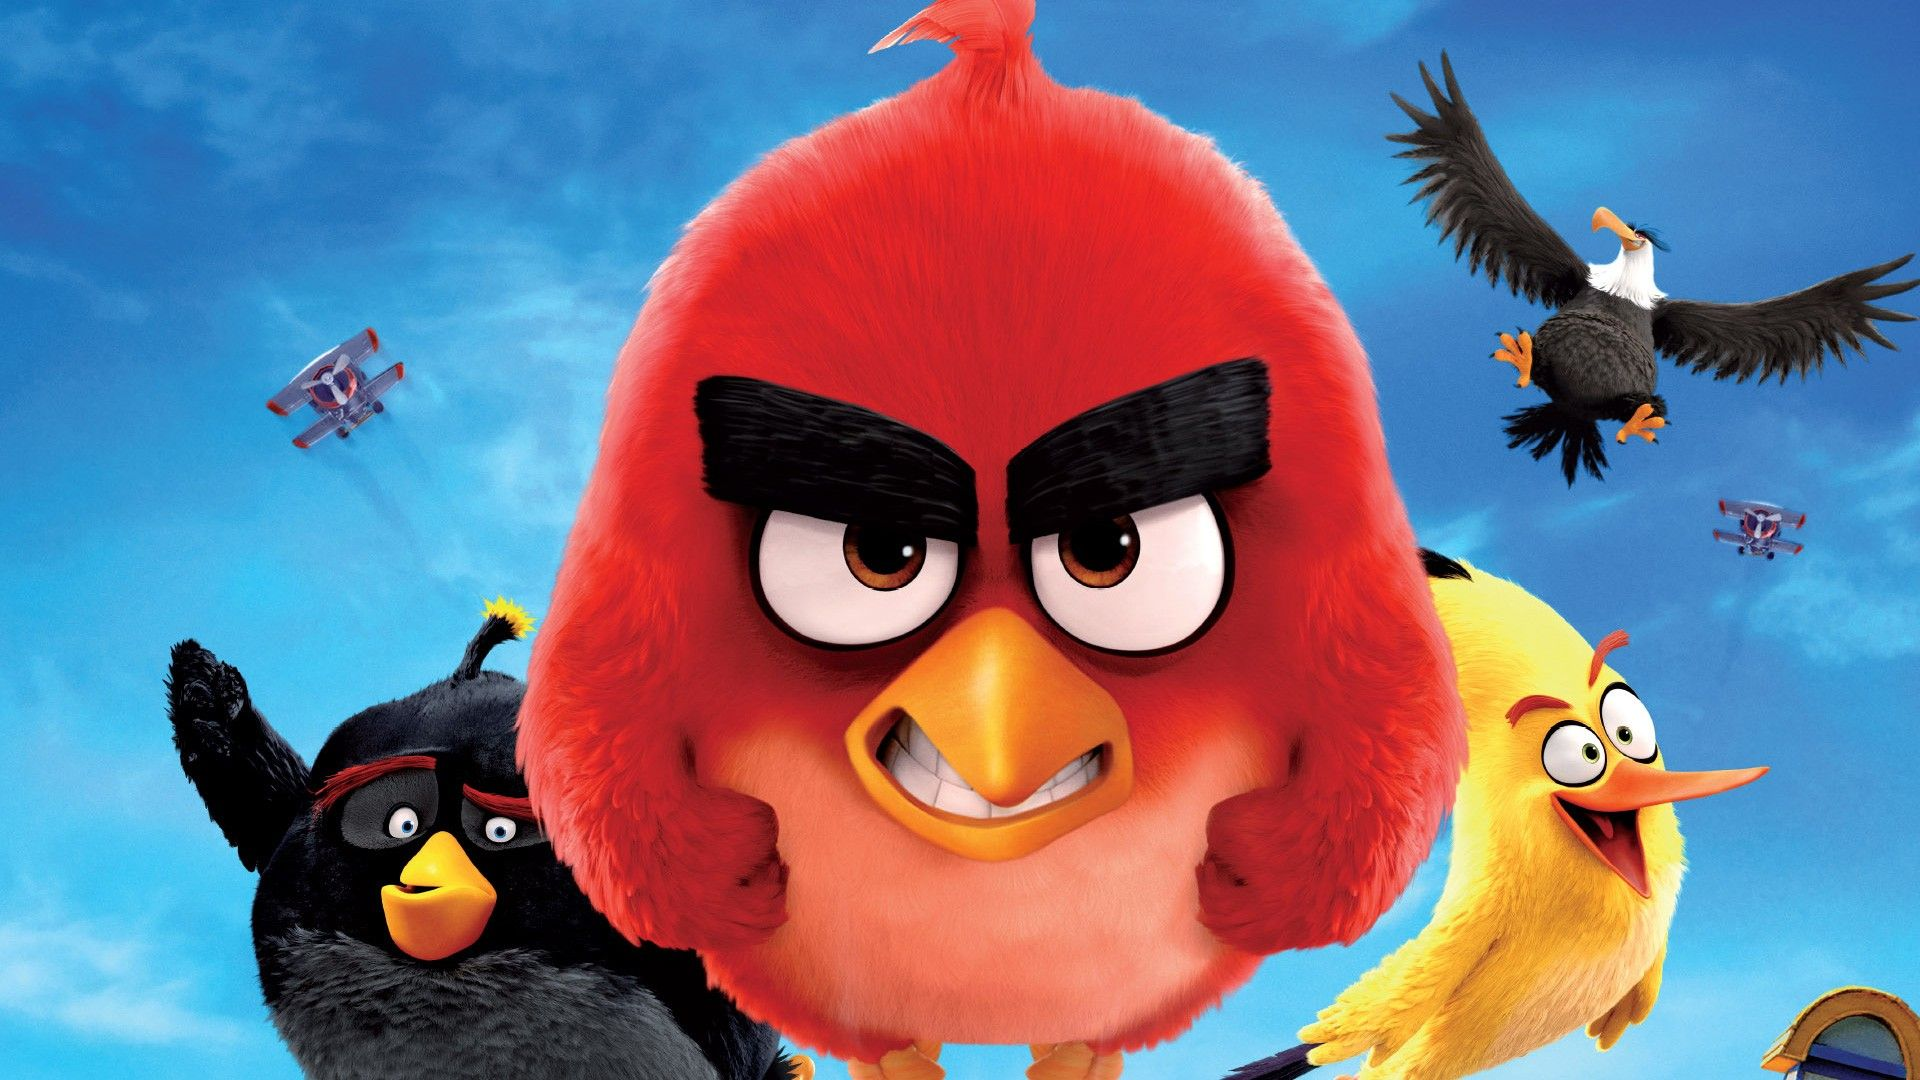 Angry Birds Cartoon 2016